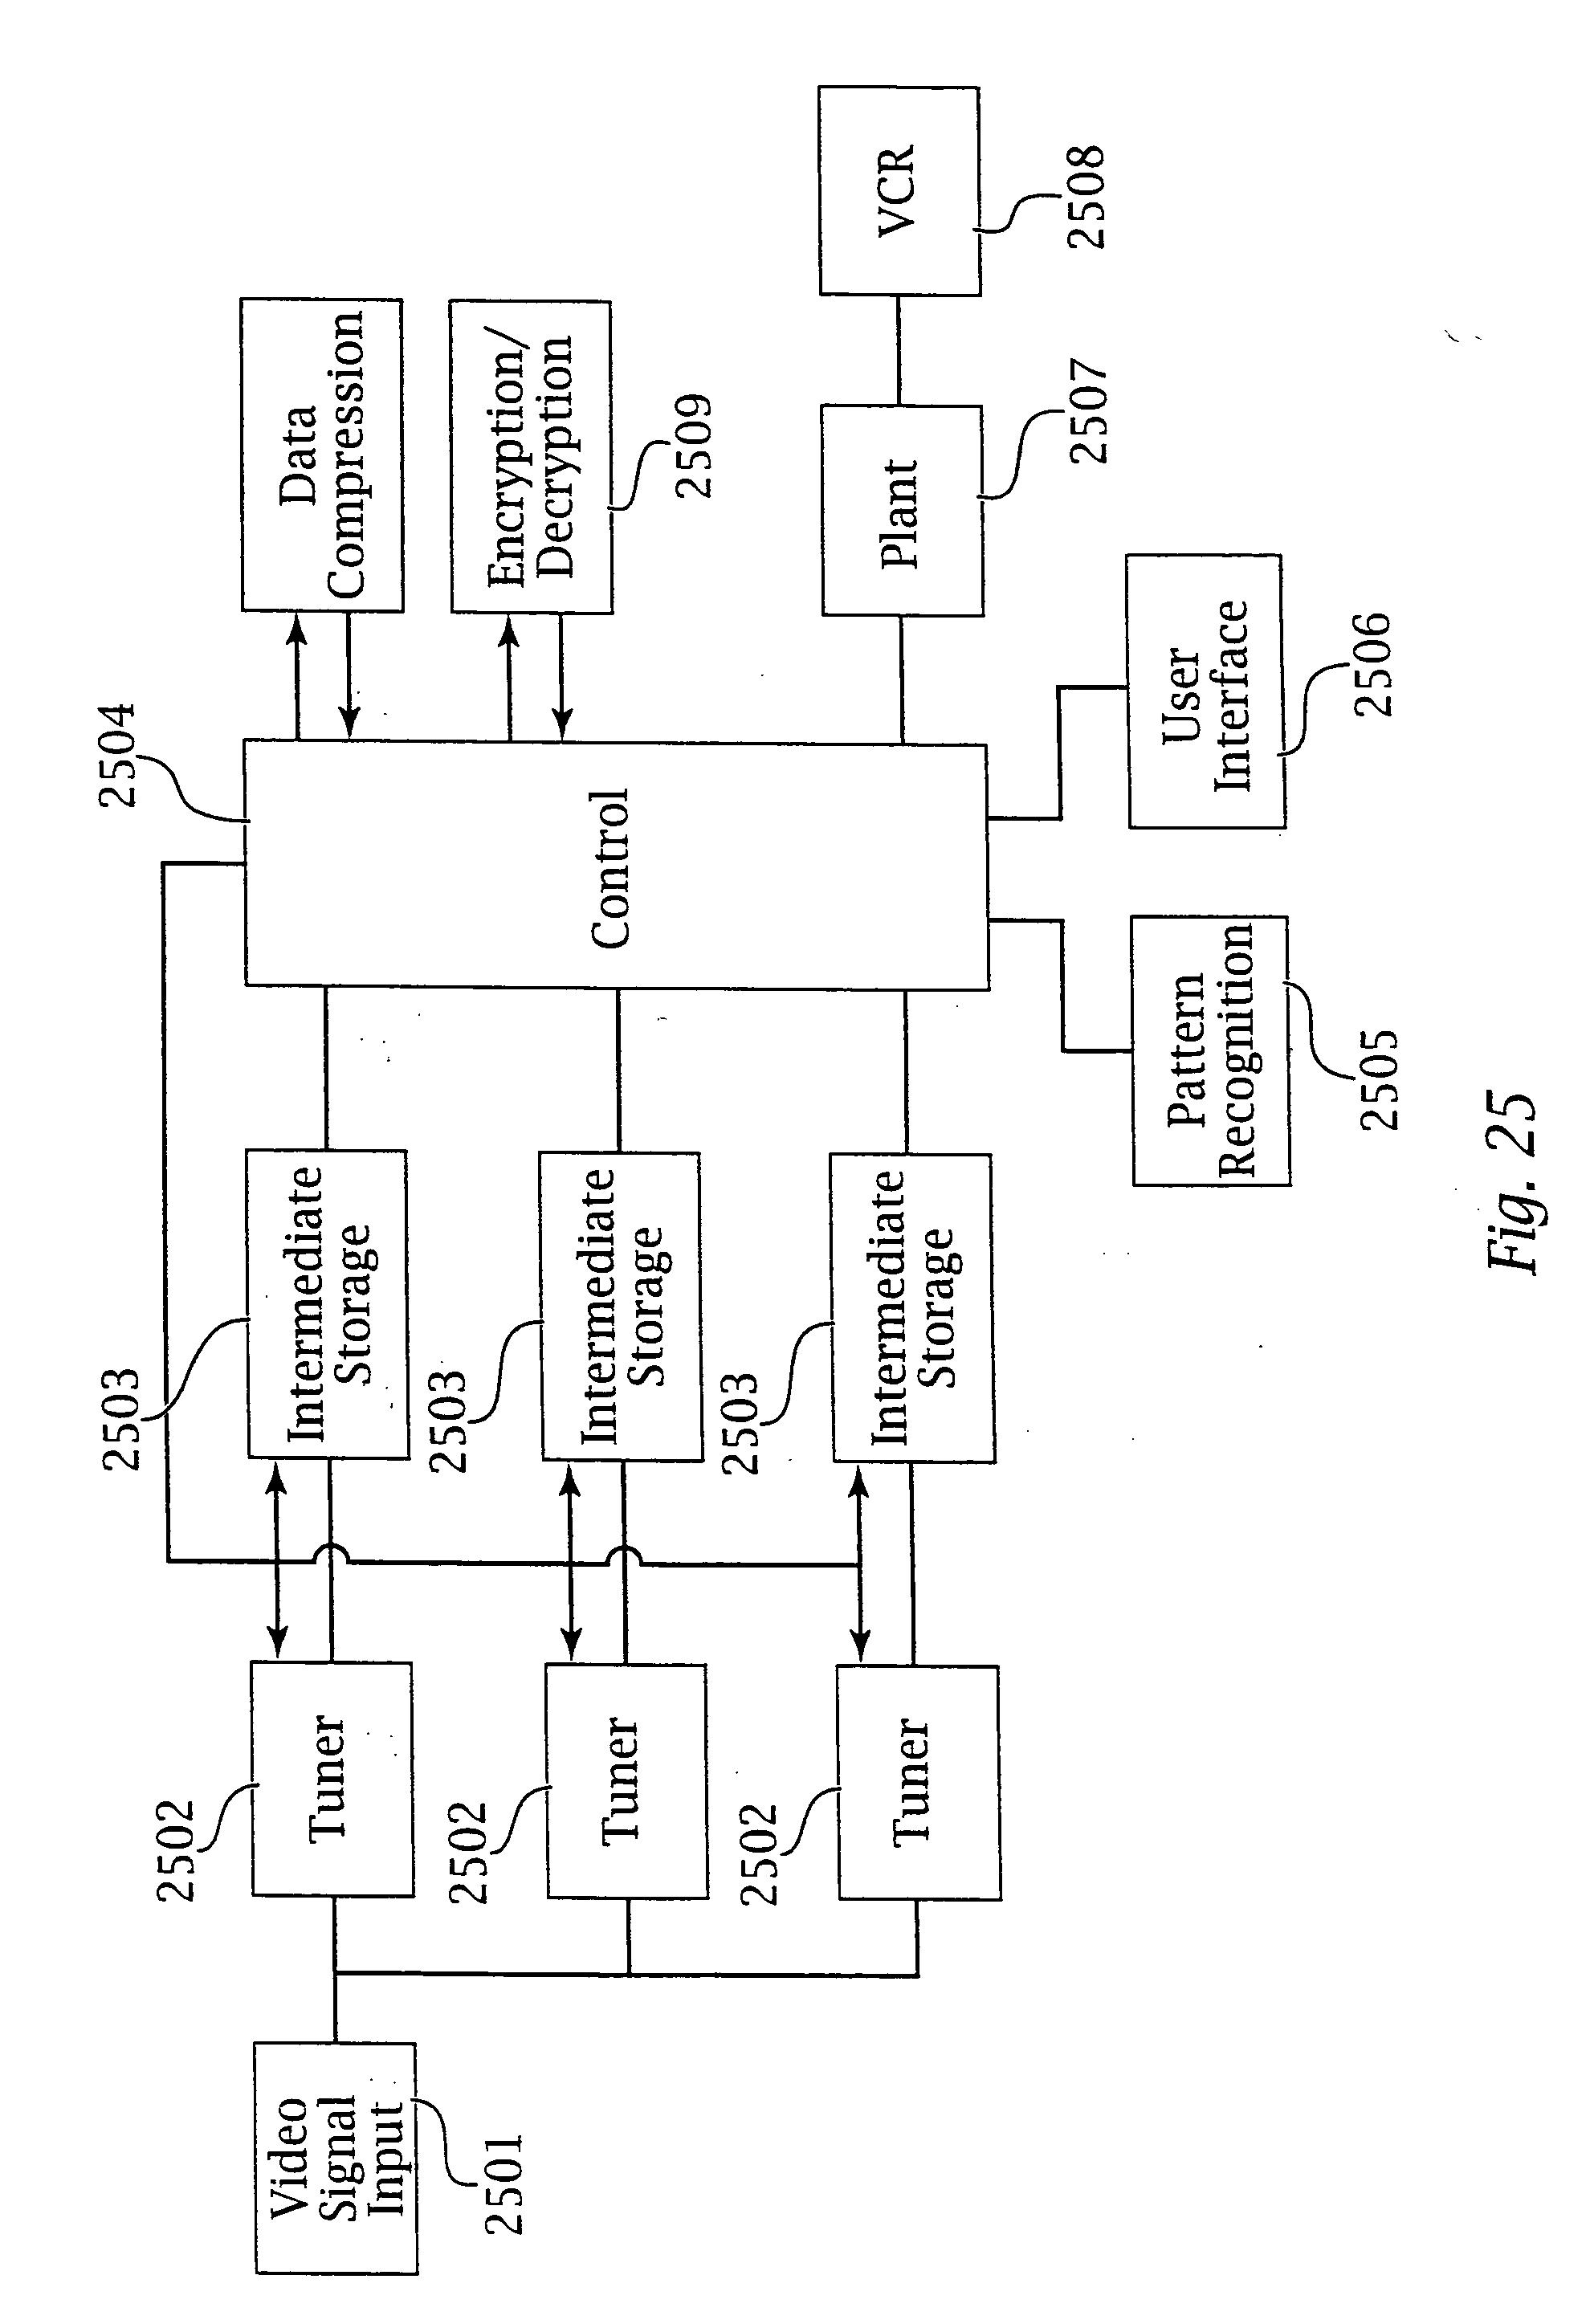 Uniden Pro Mic Wiring Diagram on